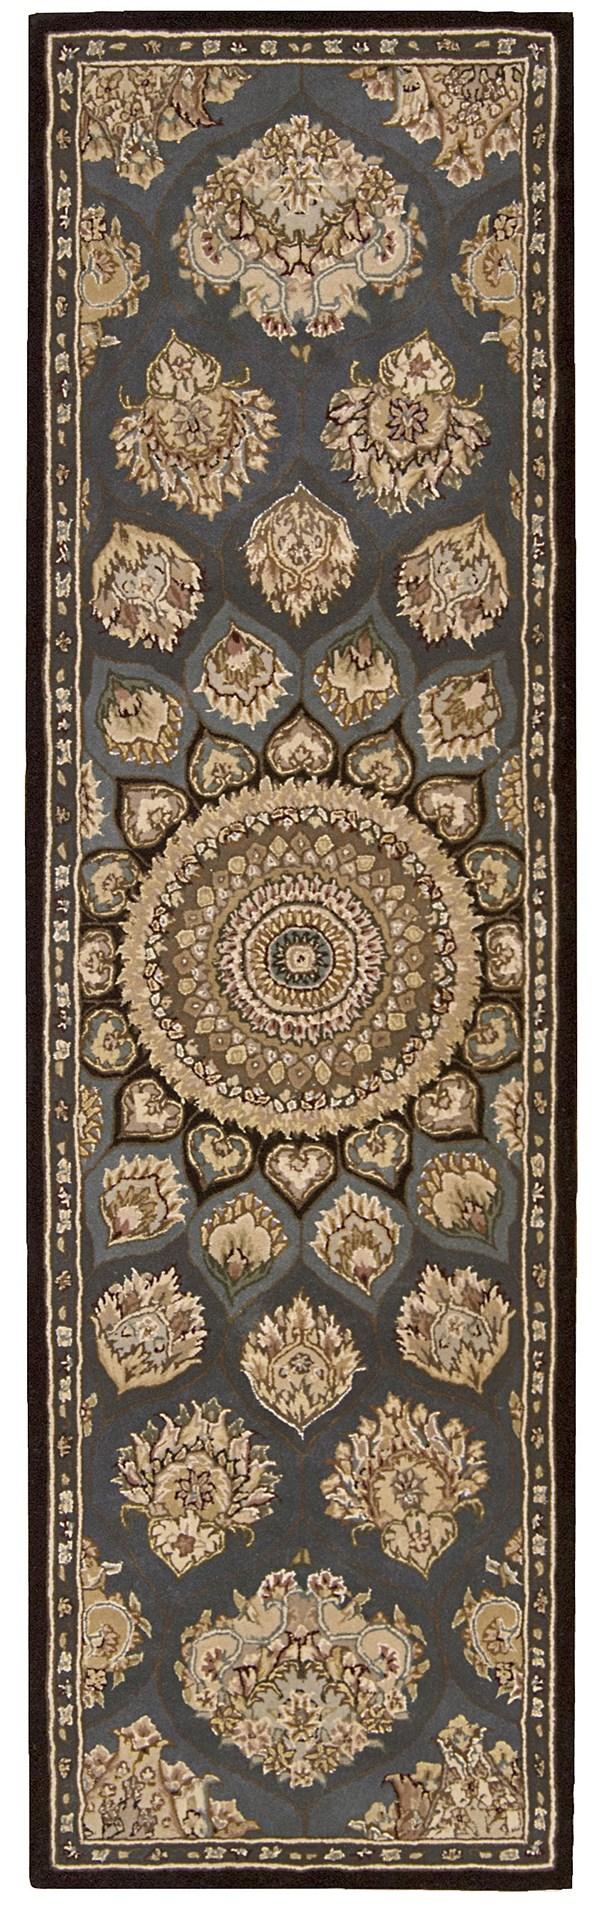 Slate Mandala Area Rug